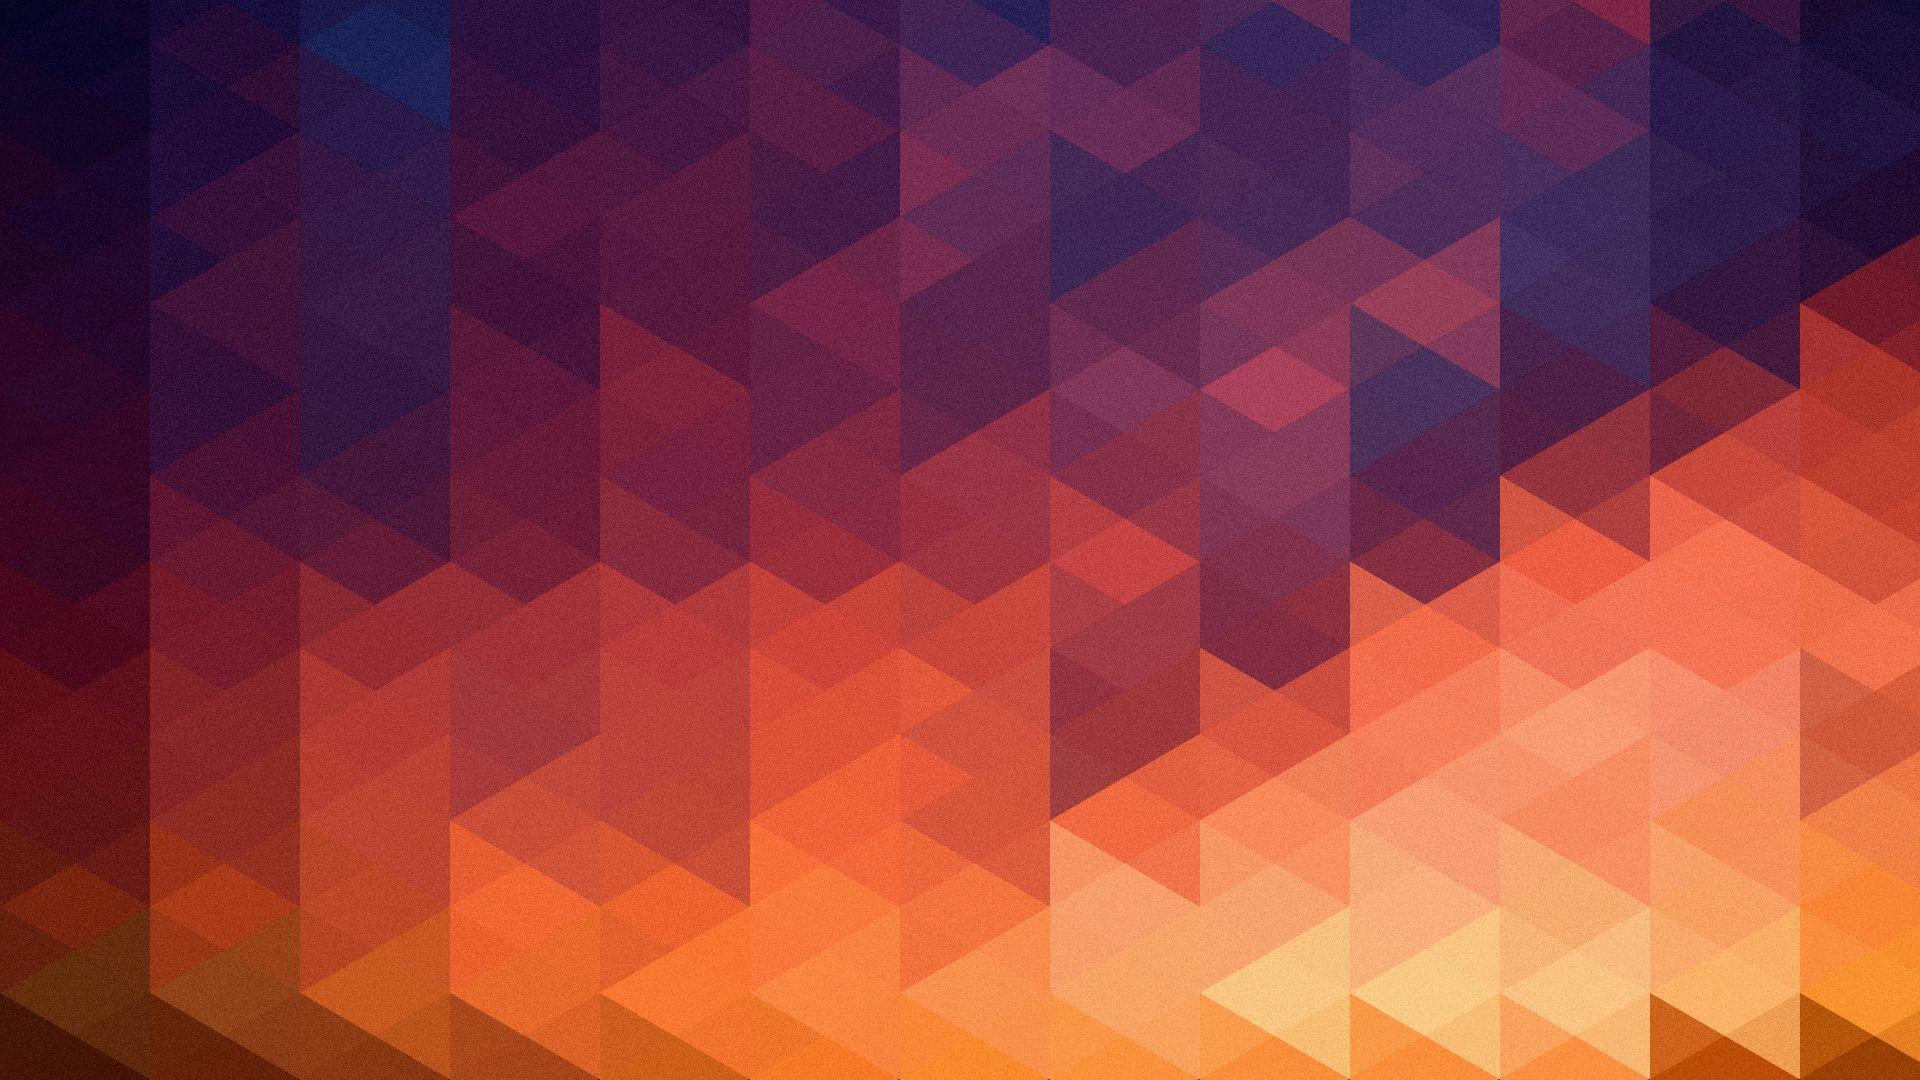 Geometric Multicolor Triangles Hd Wallpaper Fullhdwpp